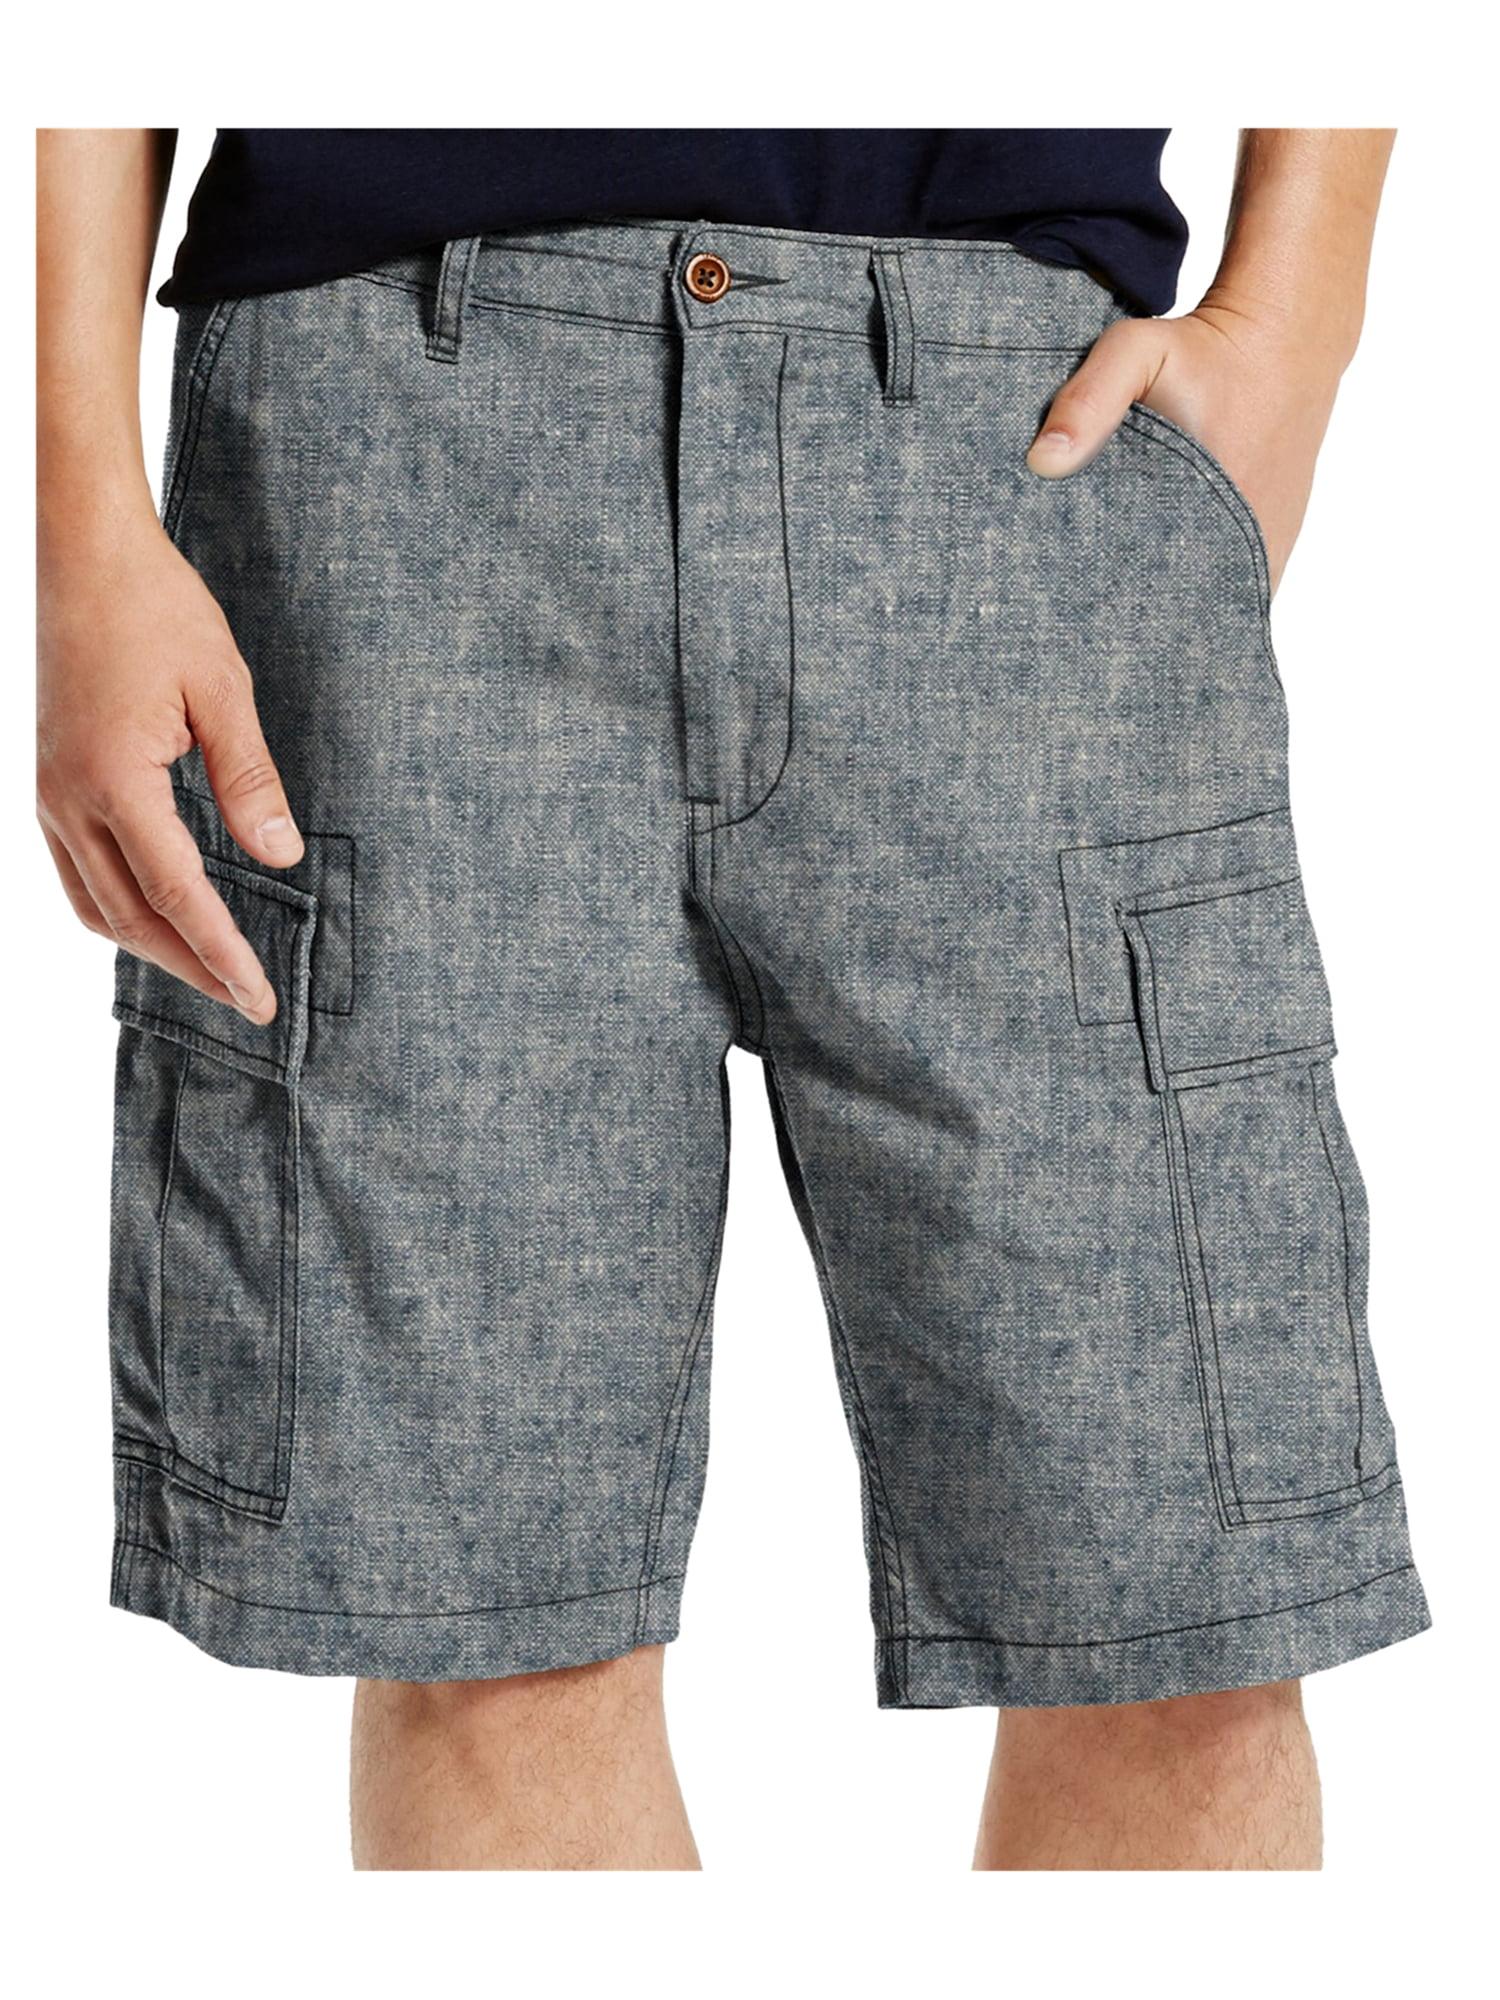 levis cargo shorts canada